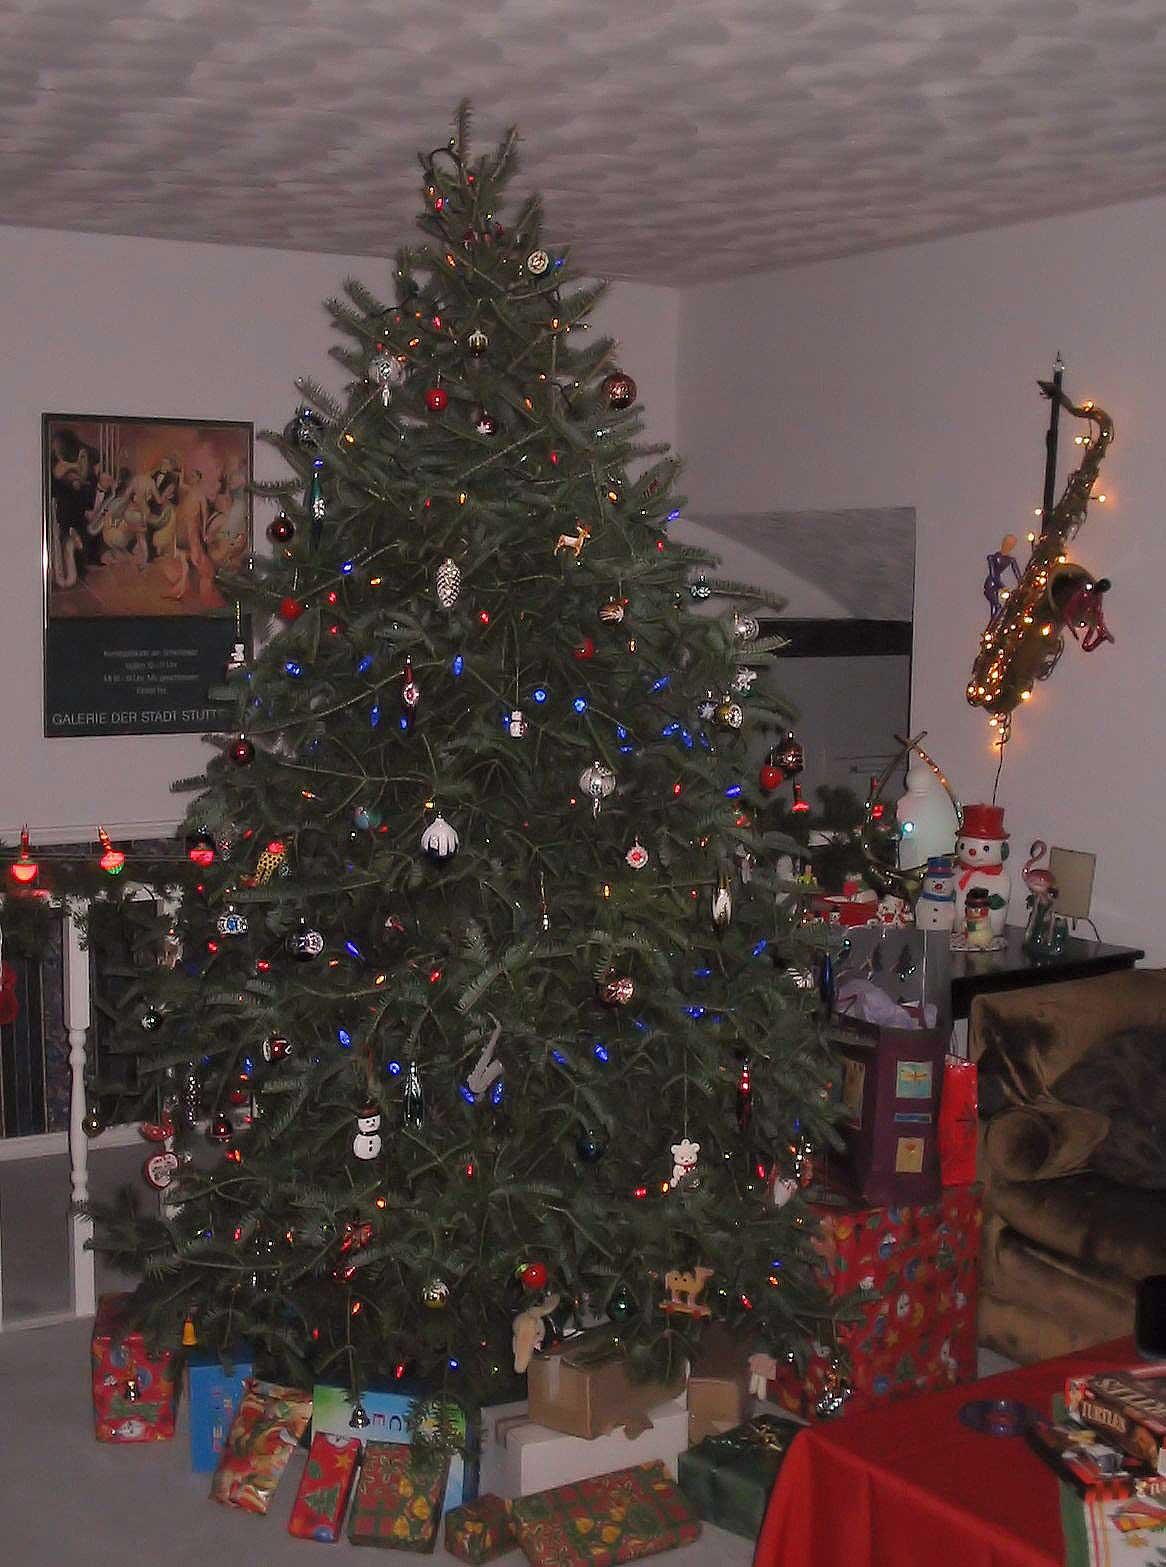 Christmas tree, saxophone as wall decoration, Christmas lights, tree ornaments, bubble lights